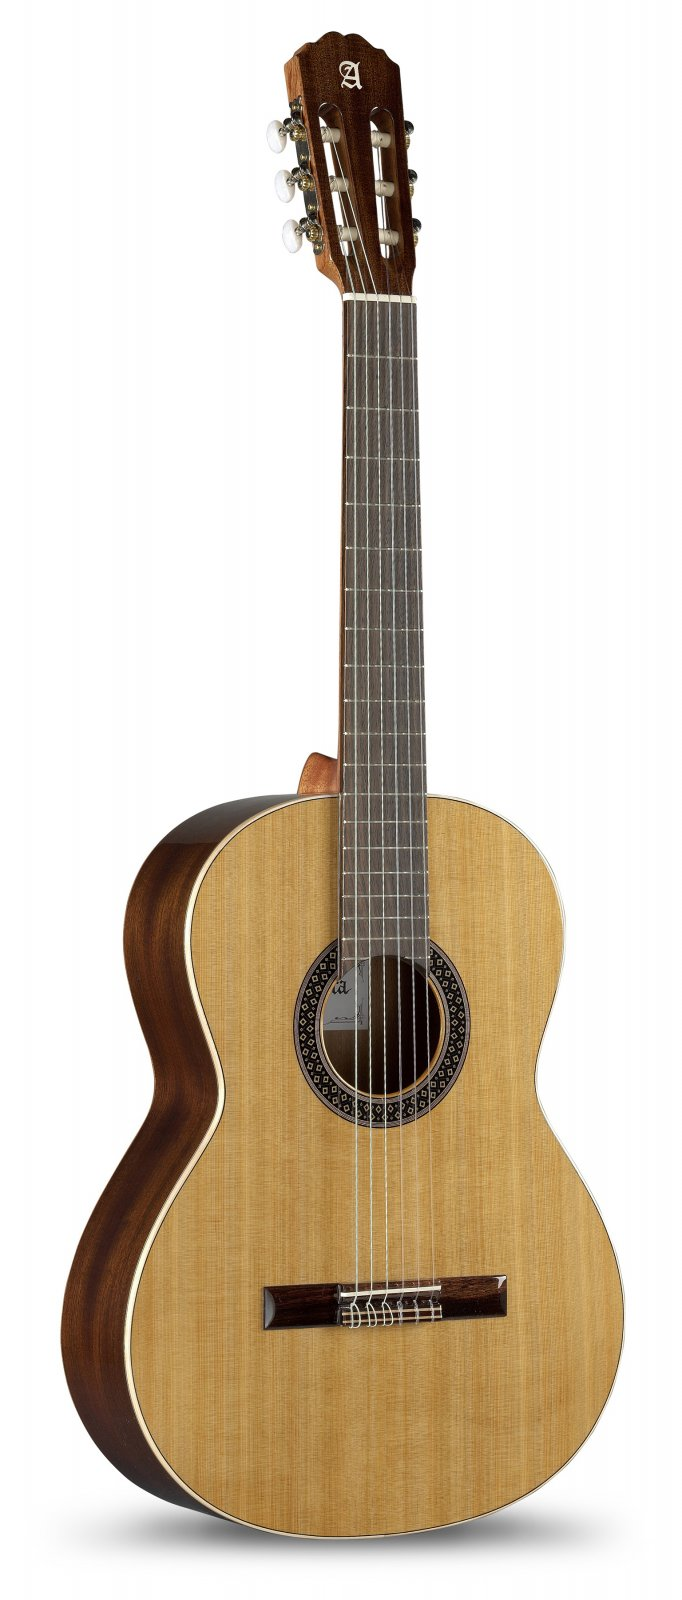 Alhambra 1C Classical Guitar with Gigbag